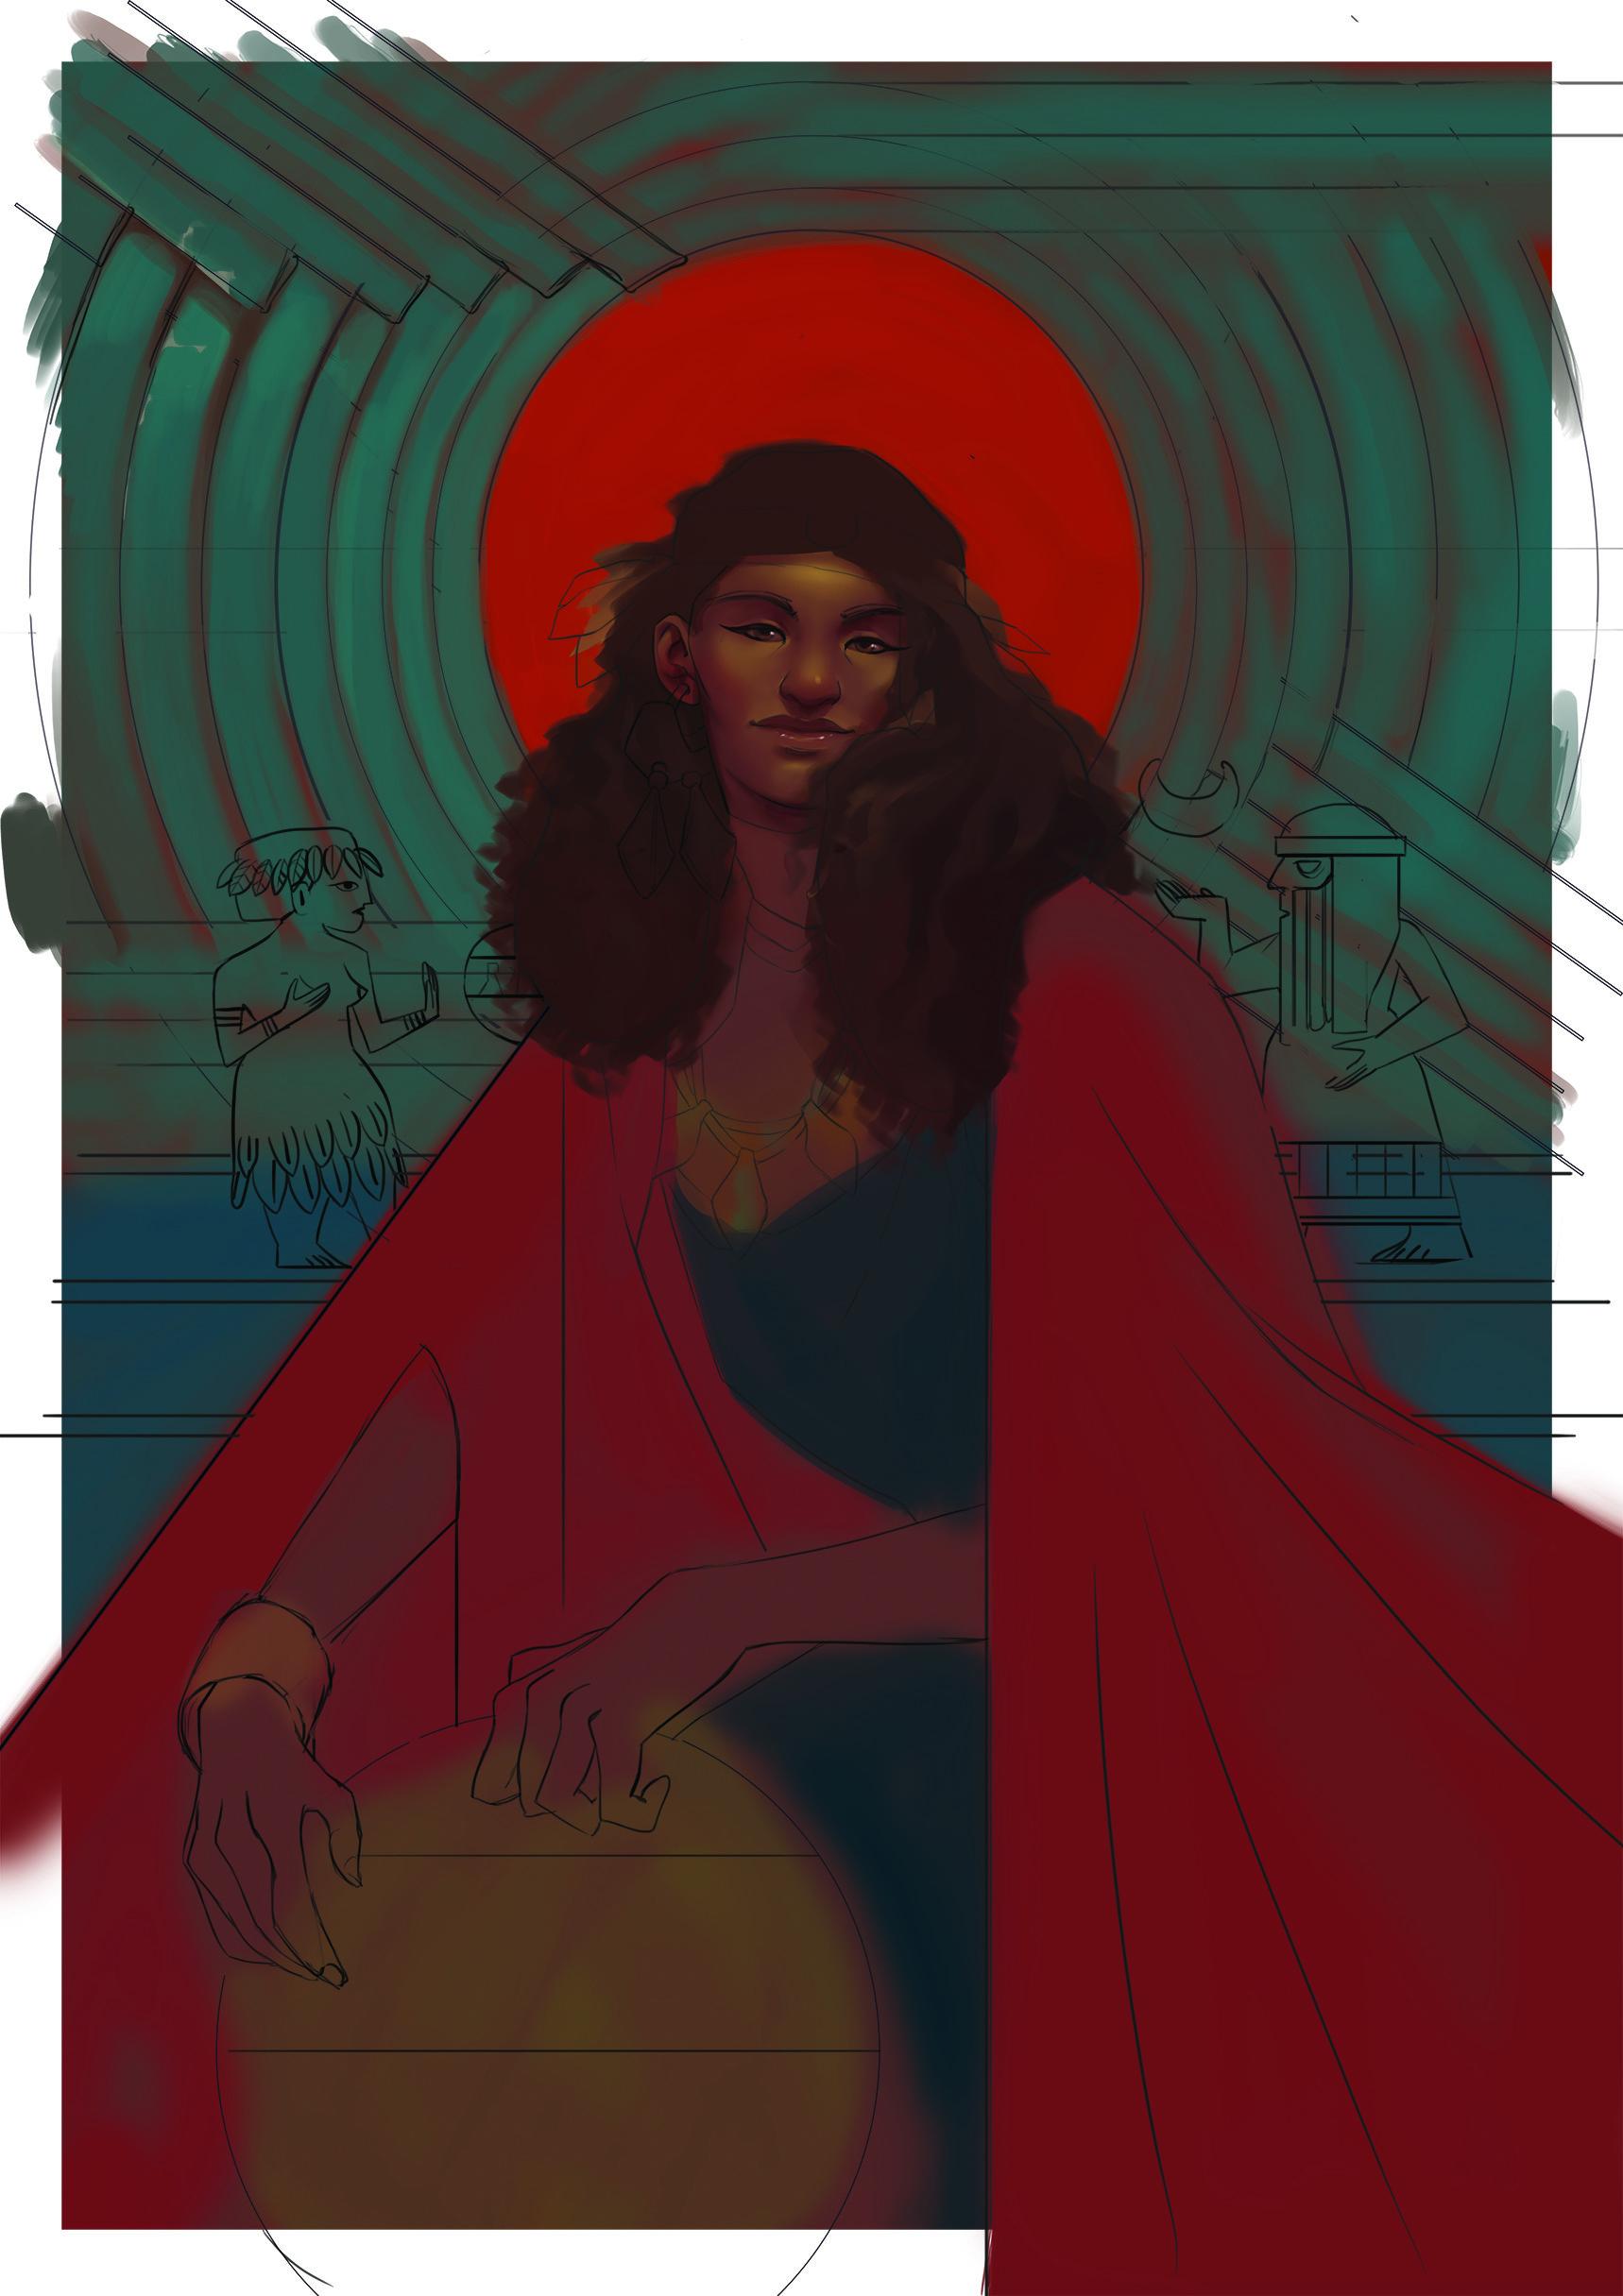 Cristina charneco enhaduanna ilustracion wip1